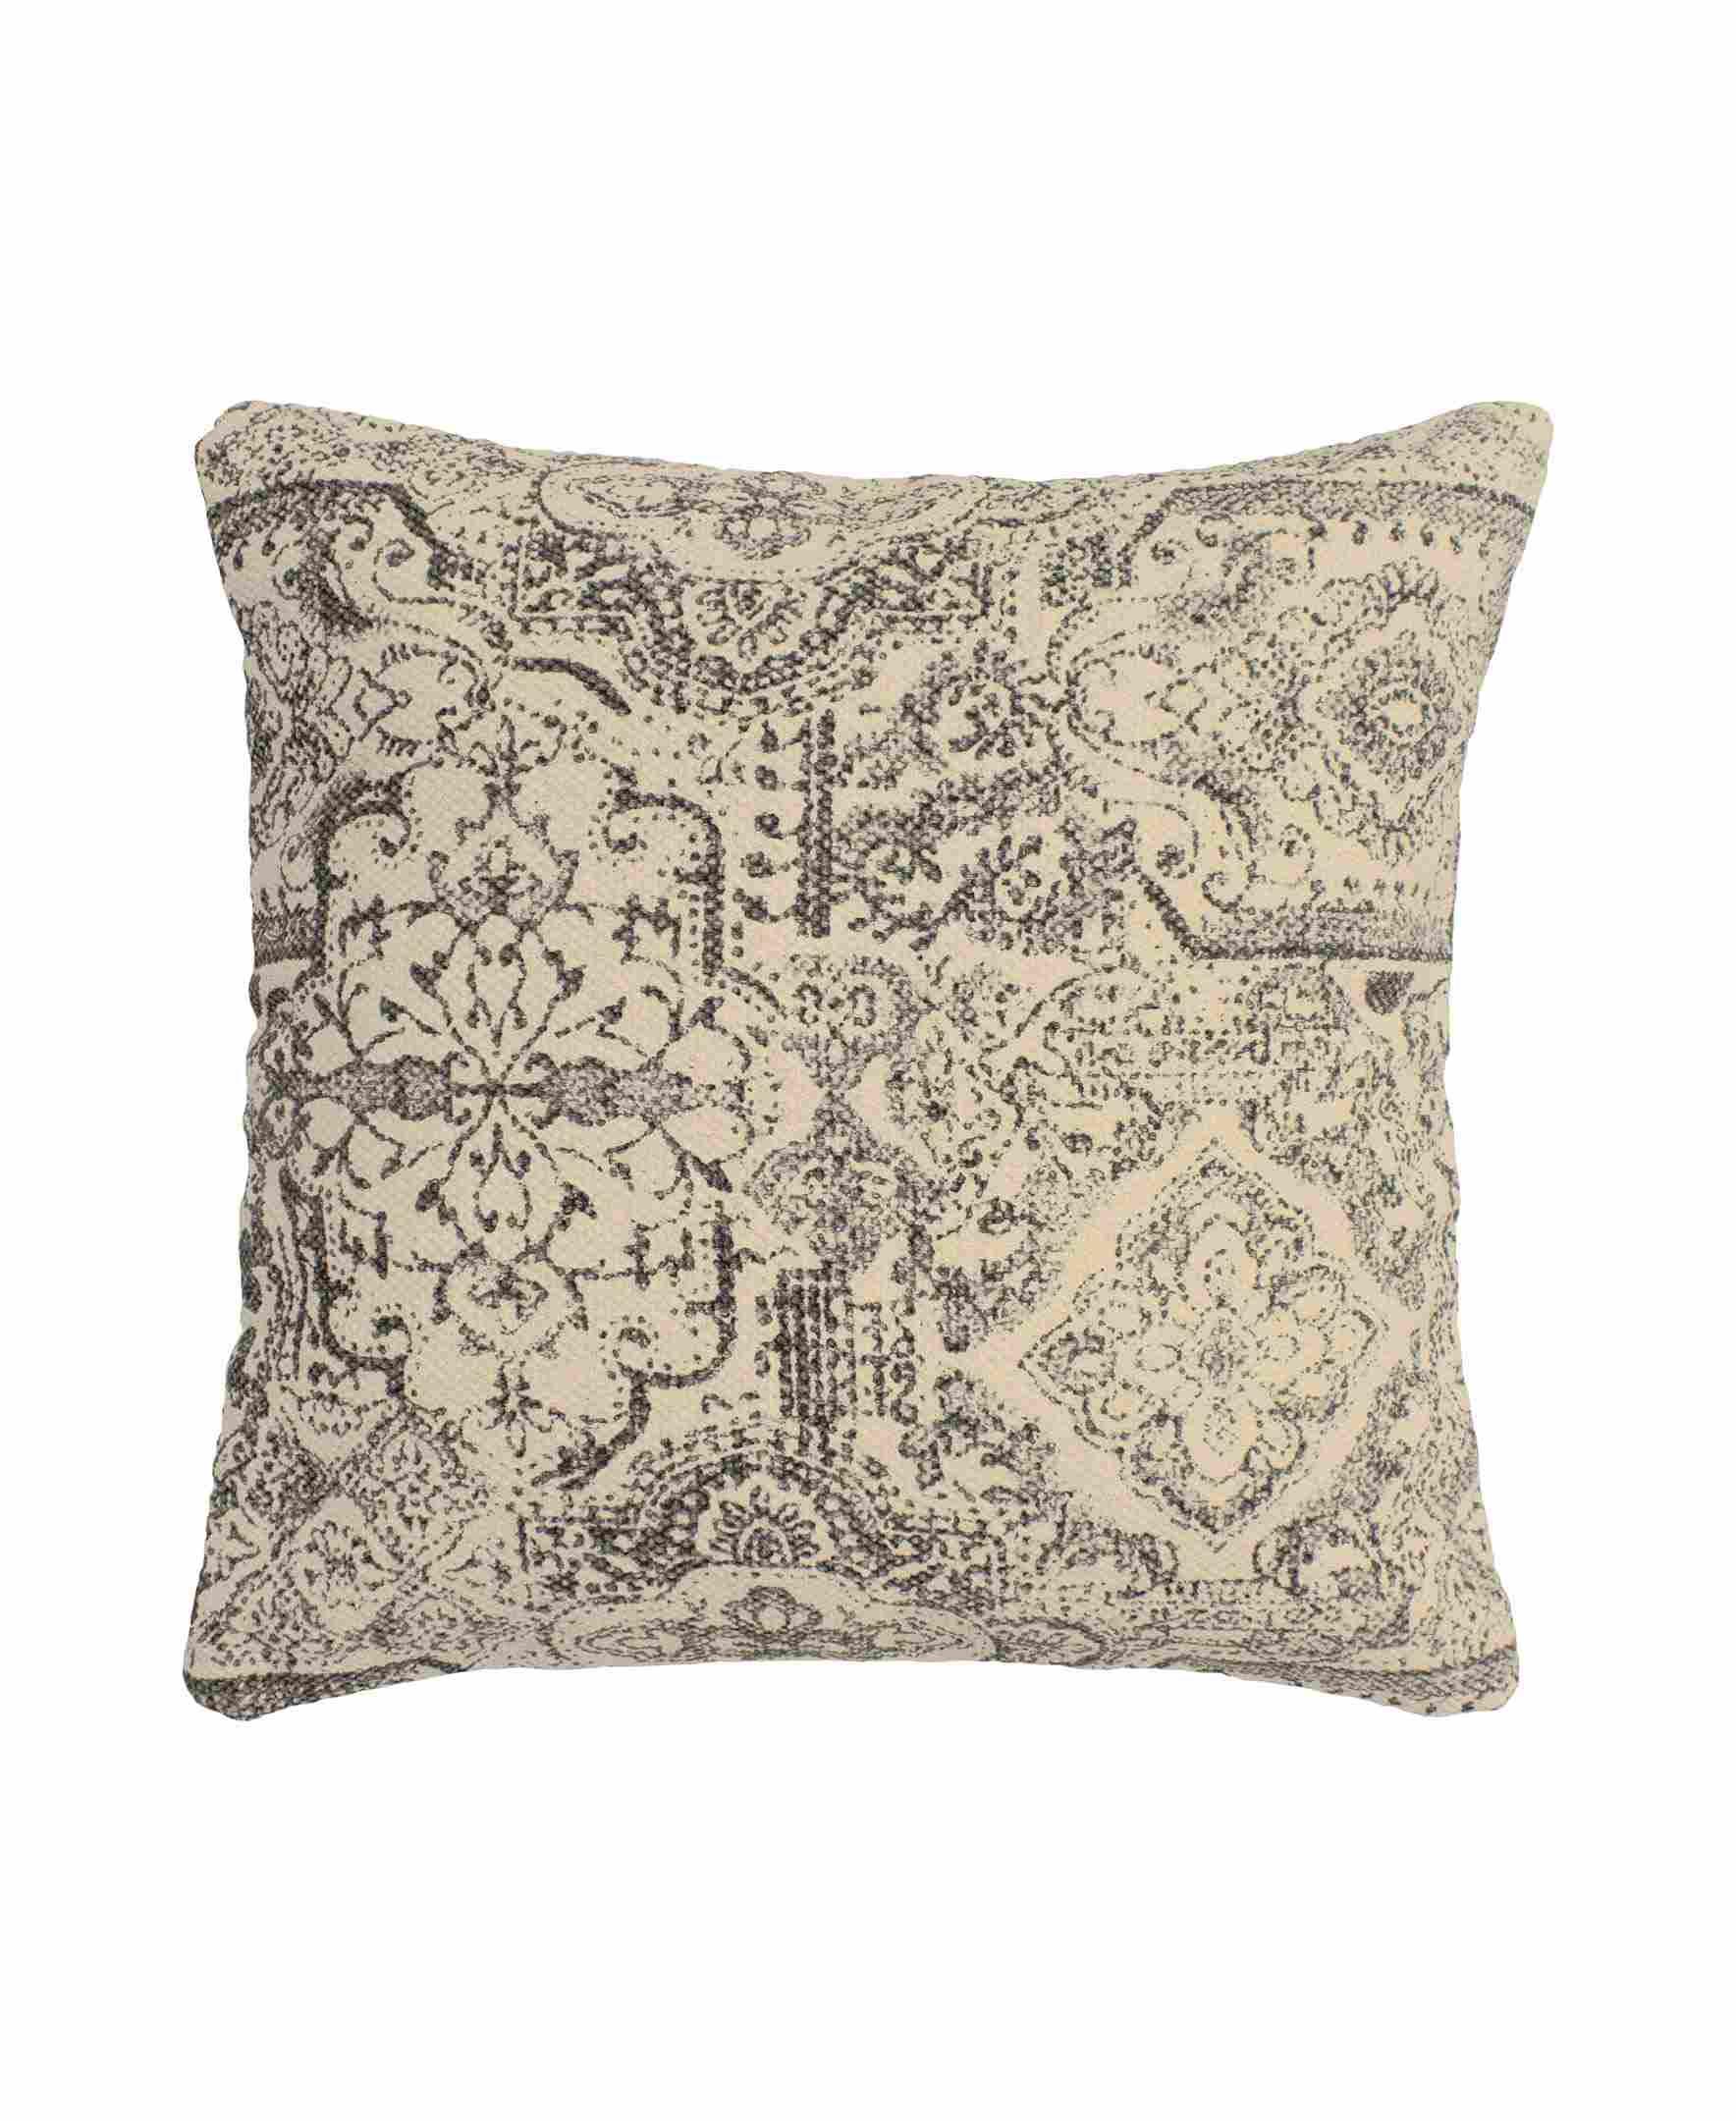 Avi Print Pillow